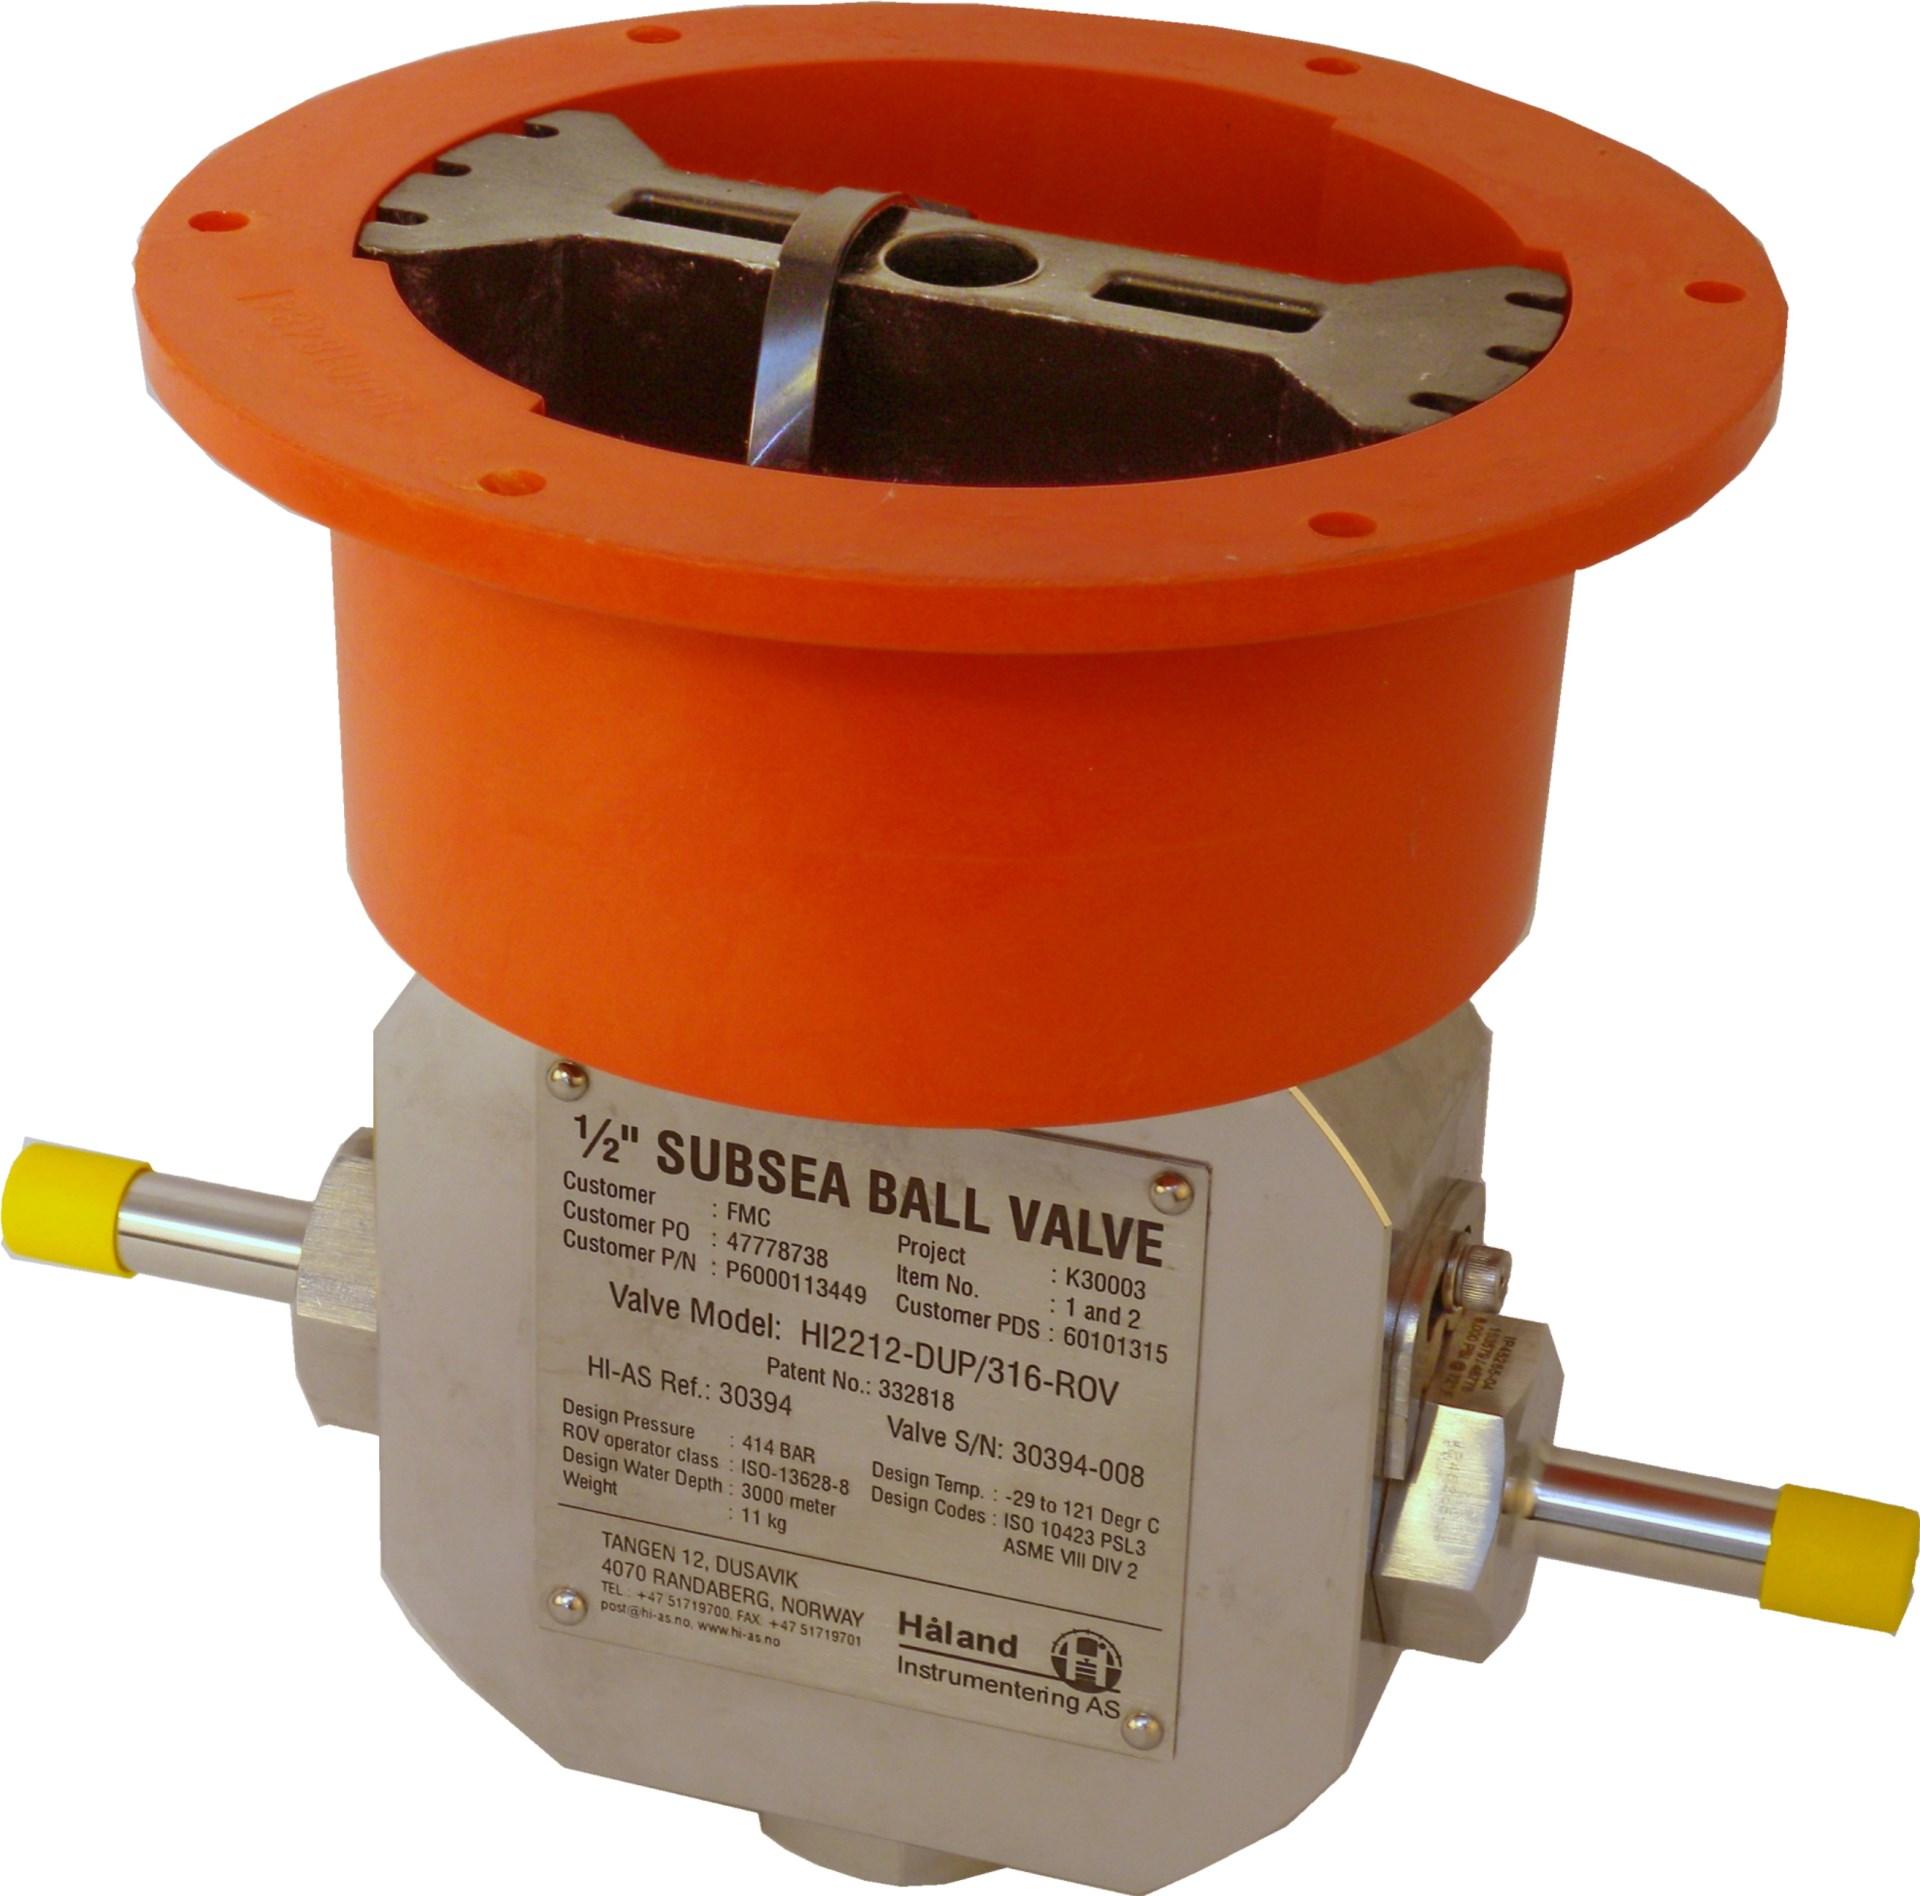 Subsea ROV operated kuleventil ballvalve elastomerfree Manifold wellhead tree High pressure temperature Manufacturer